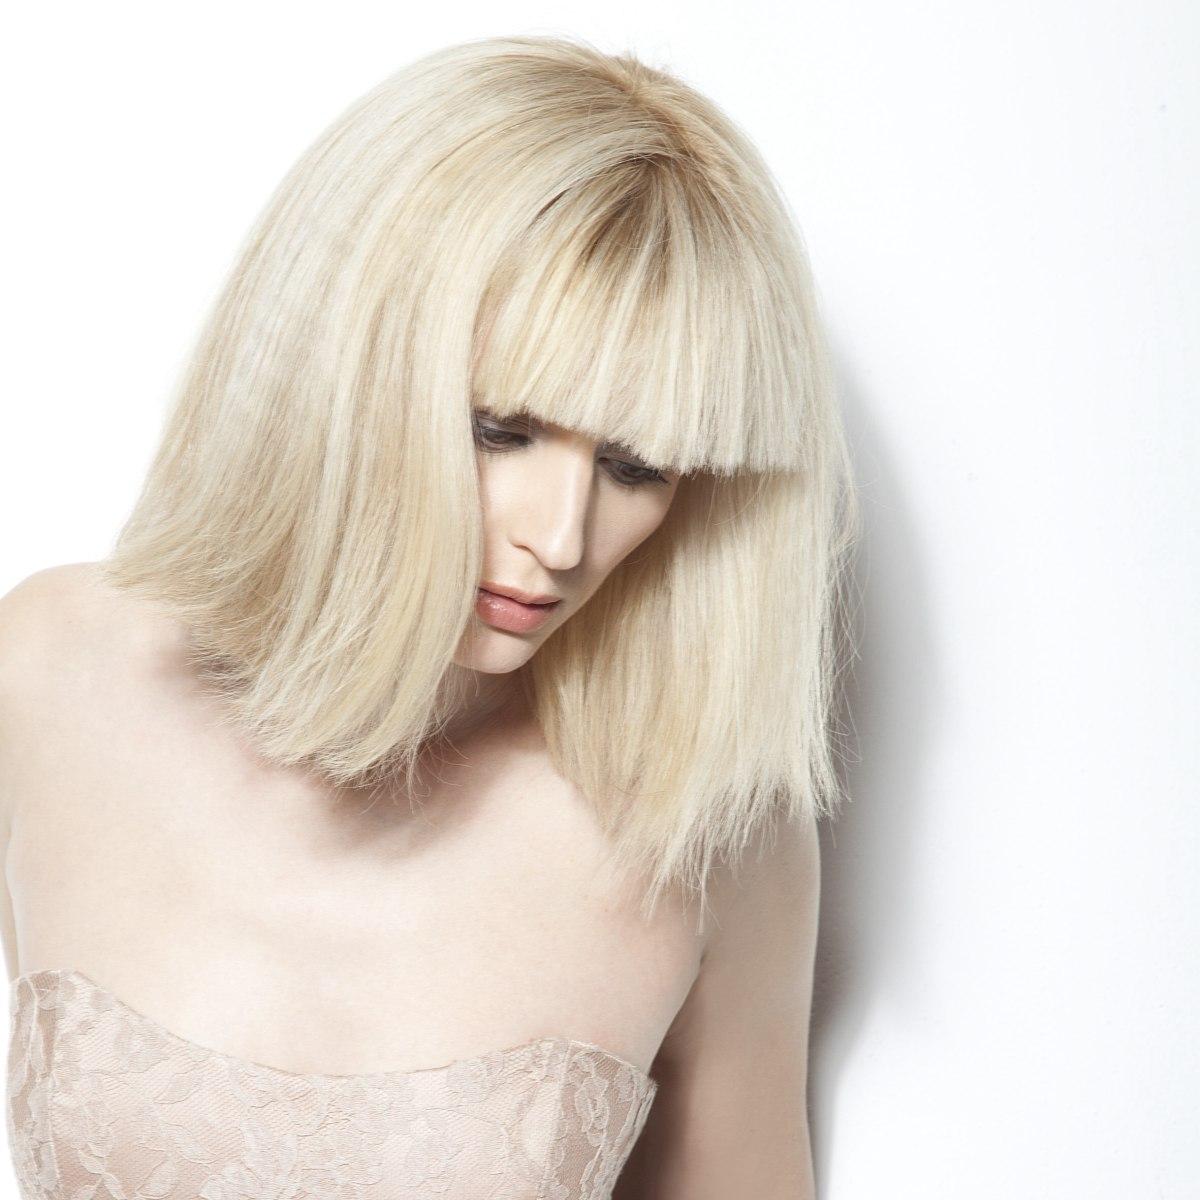 Admirable Platinum Blonde Bob Cut Blunt All Around The Perimeter Short Hairstyles Gunalazisus